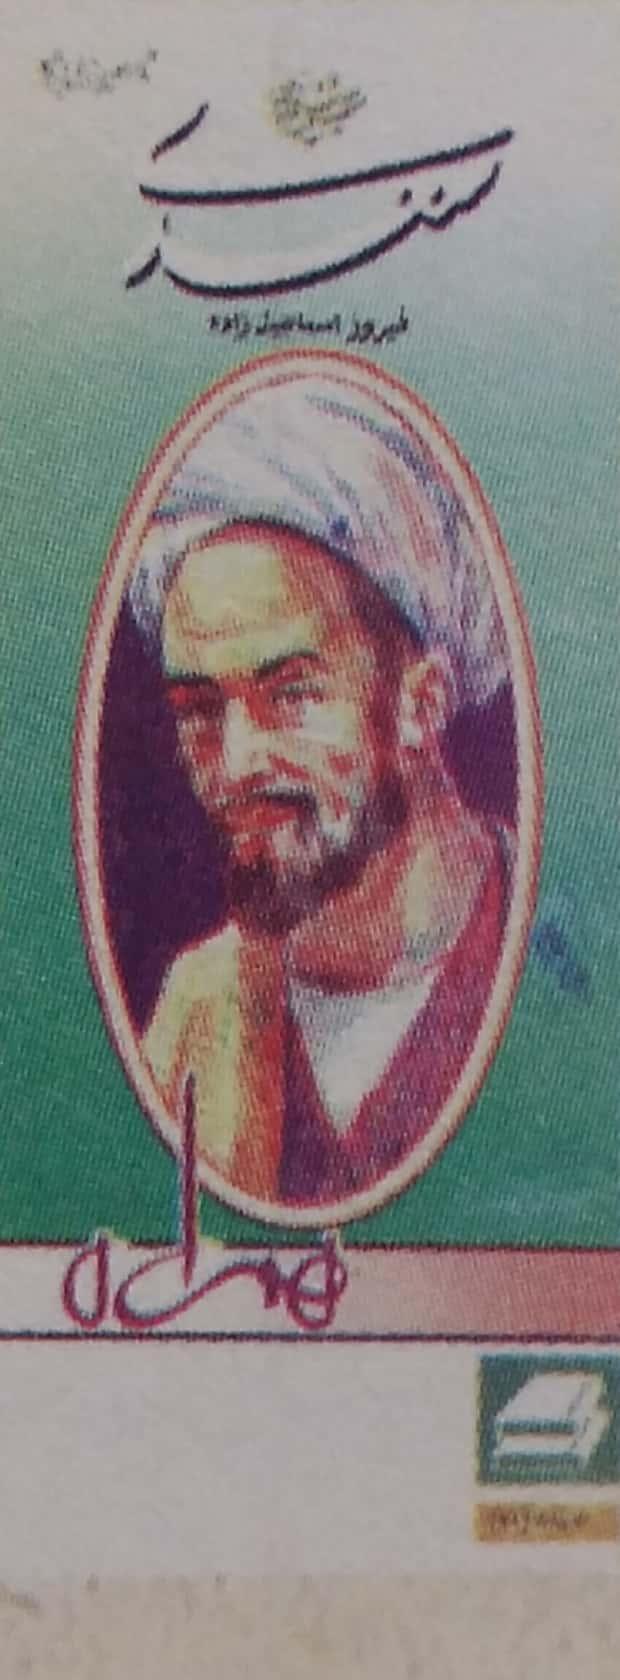 بنياد فارس شناسي شیخ مصلح الدین سعدی (اثر فیروز اسماعیل زاده)